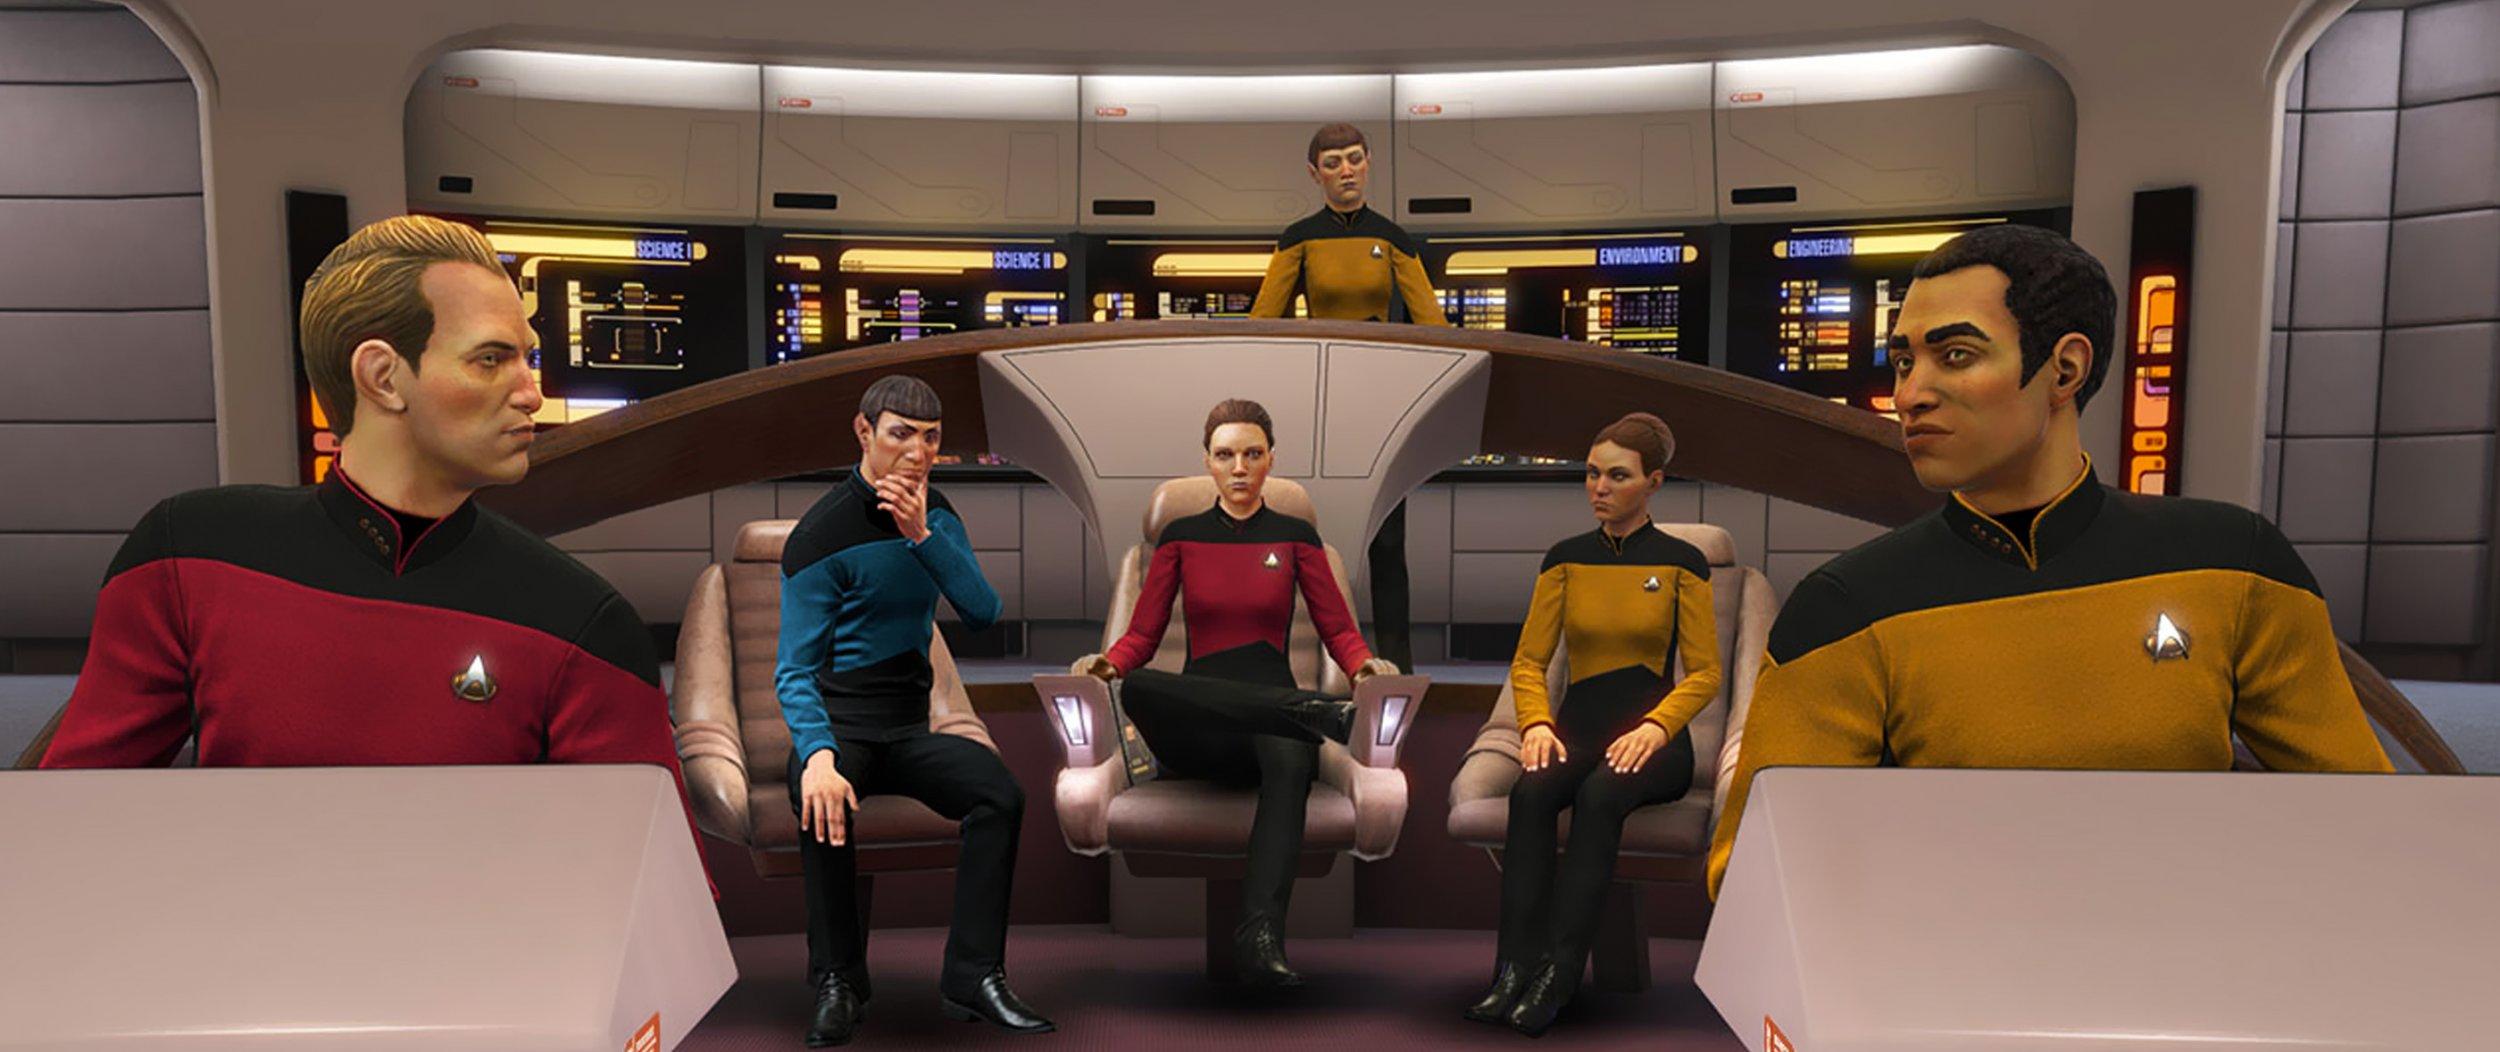 star-trek-bridge-crew-enterprise-tng